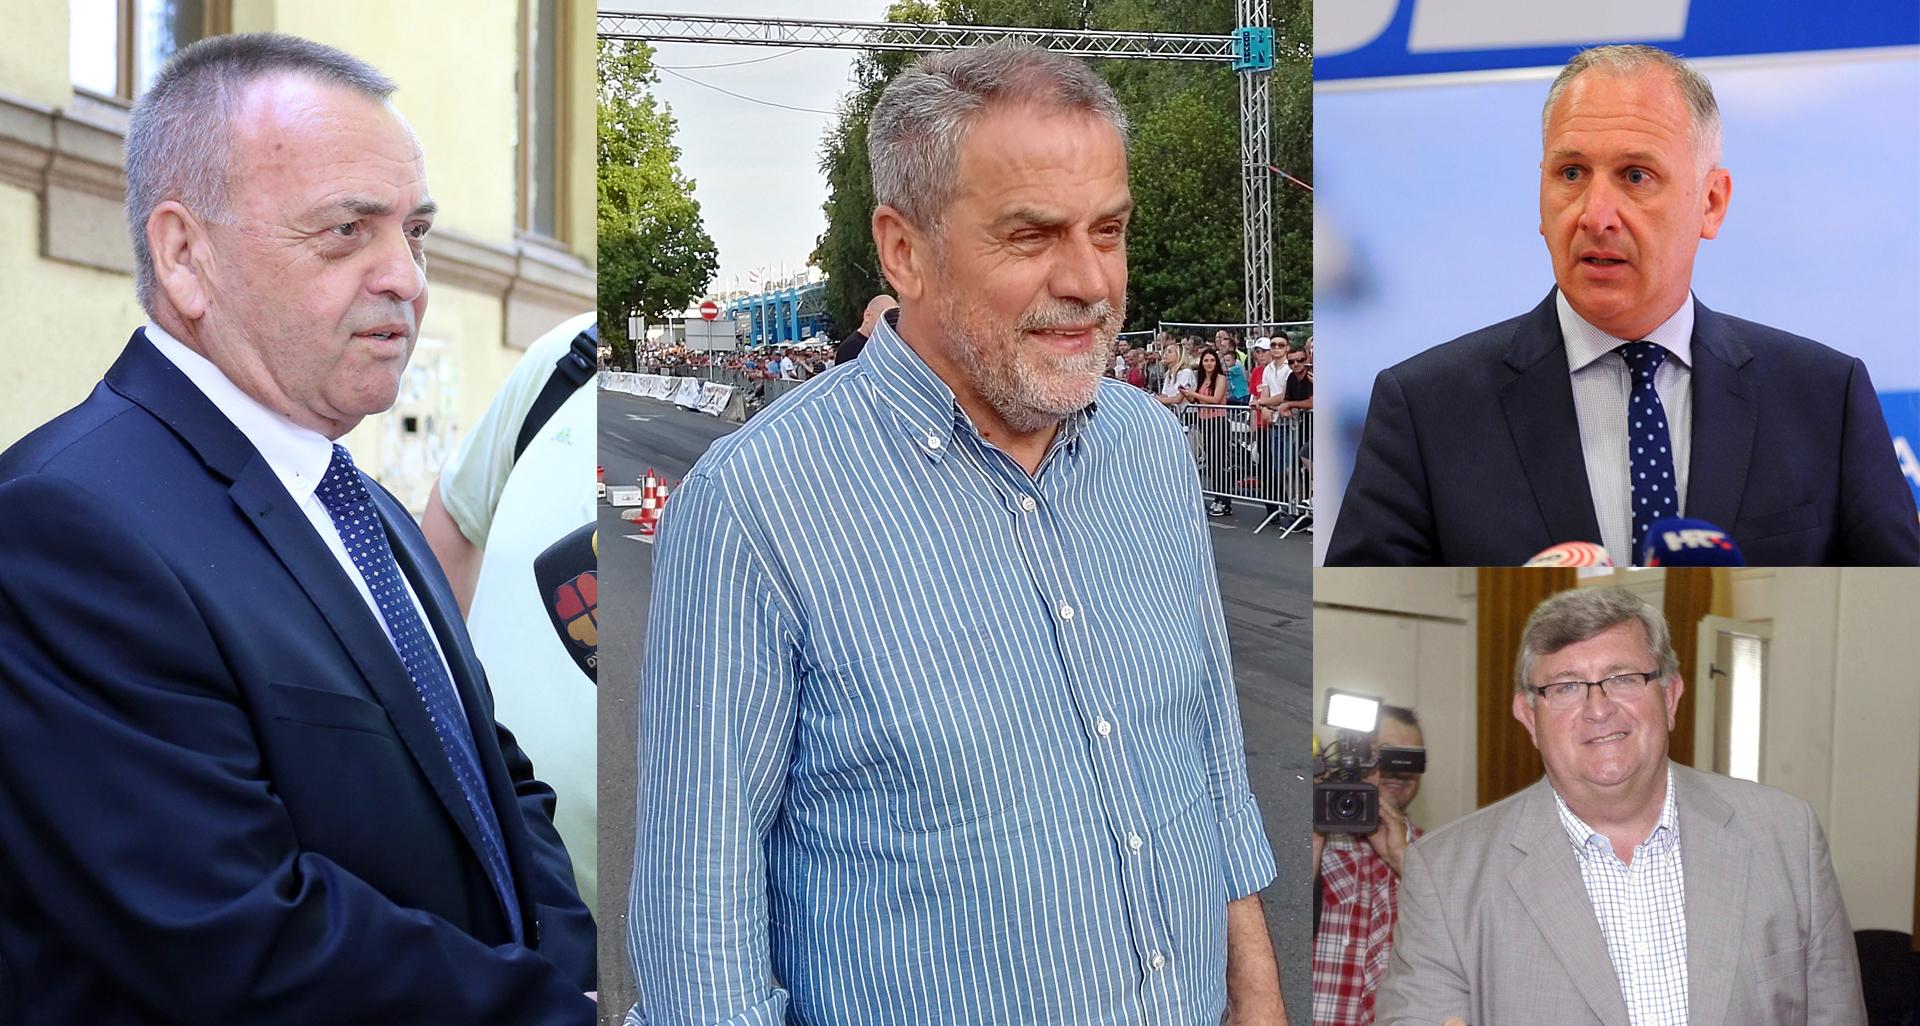 DIP Bandić, Opara, Vrkić i Obersnel na čelu velikih gradova